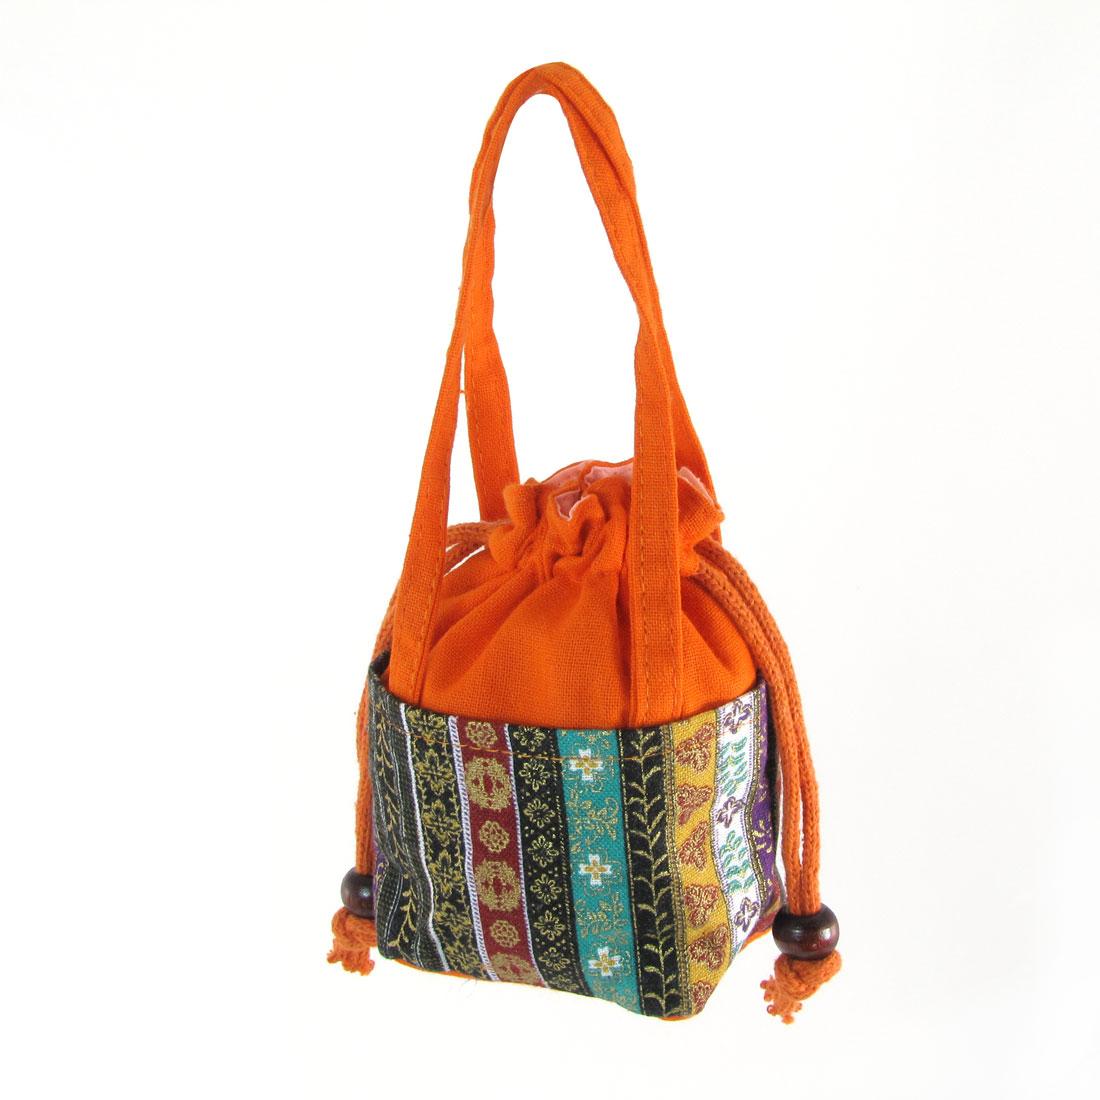 Woman Flower Print Drawstring Closure Orange Nylon Coin Tote Bag Purse